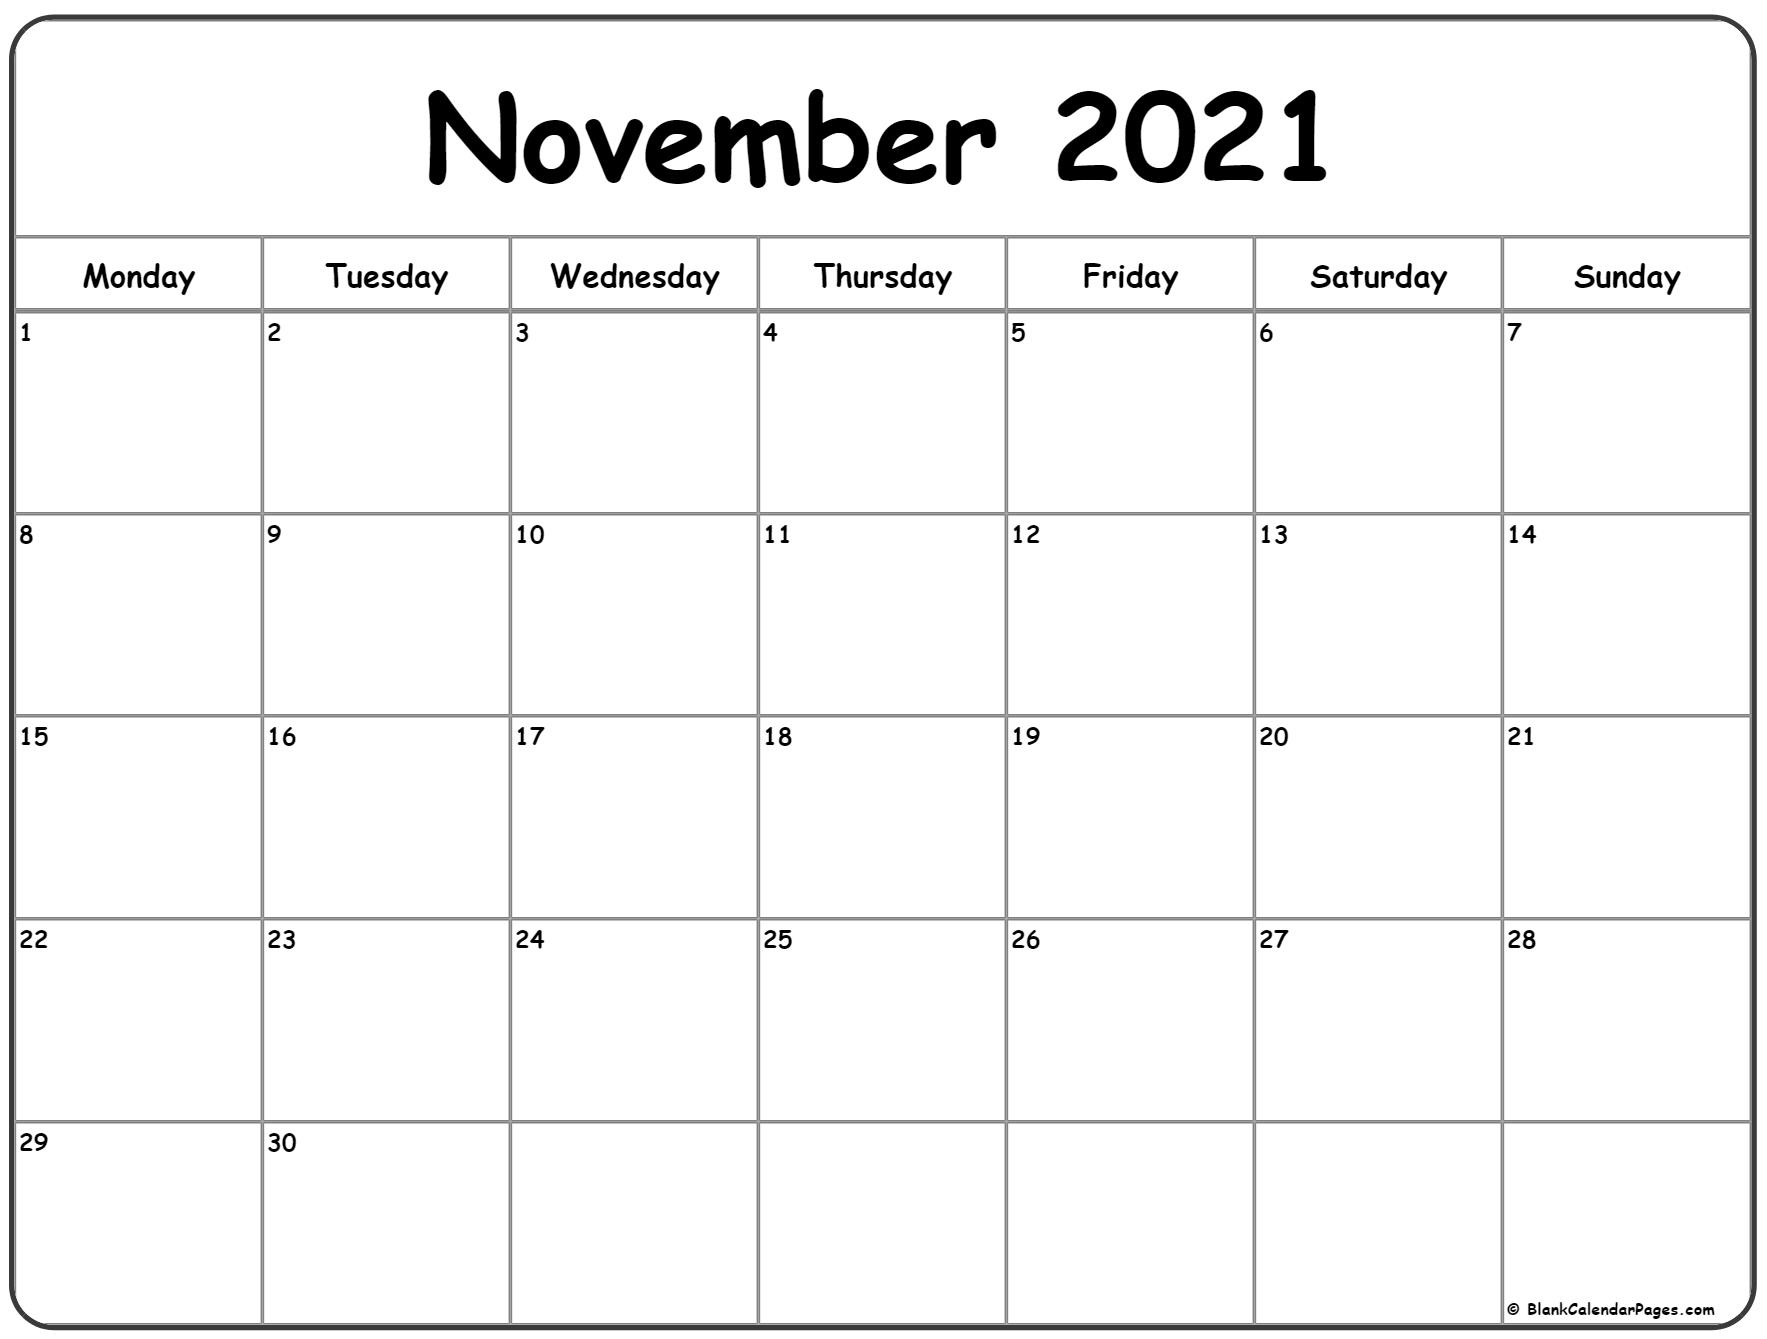 Pick November Calender 2021 Starting Monday Pretty